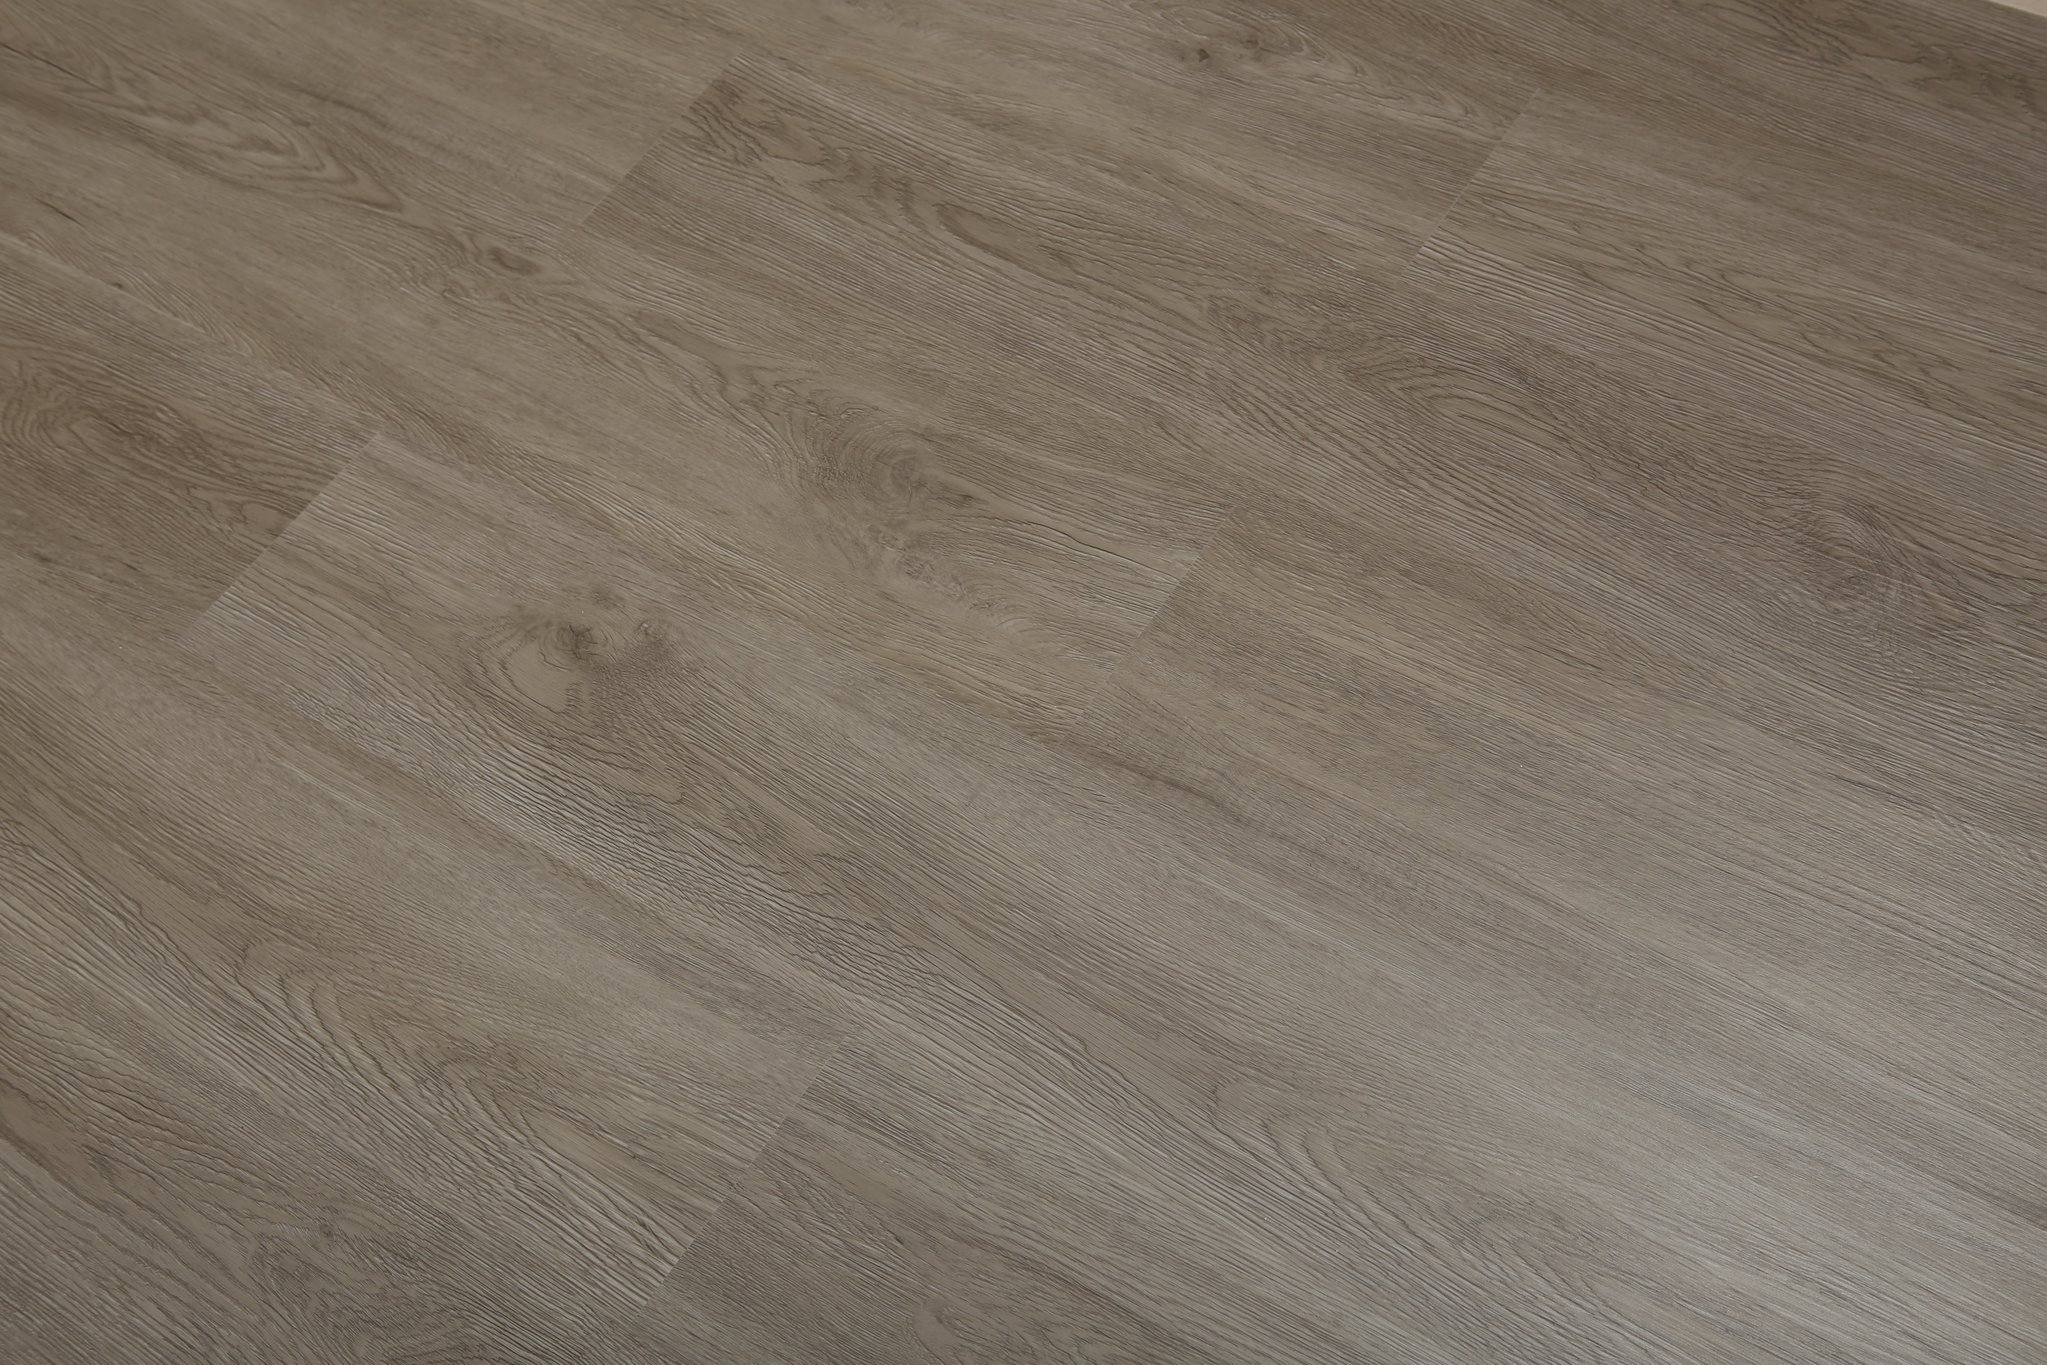 Toucan Flooring's SPC Collection